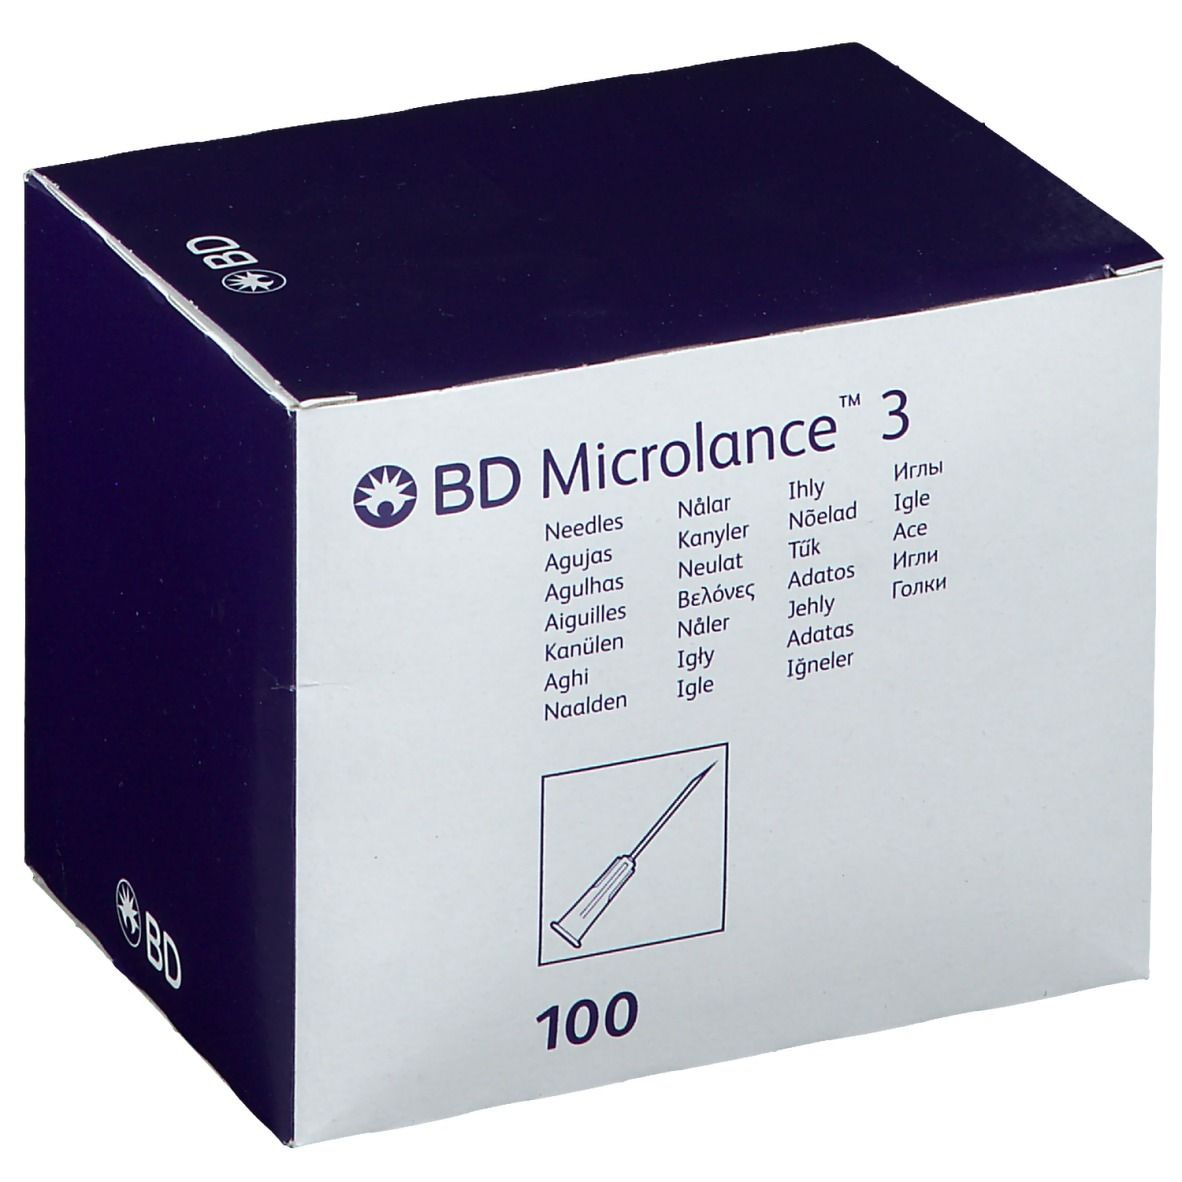 Image of BD Microlance § Sonderkanüle 16 G 1 1/2 1,65 x 40 mm